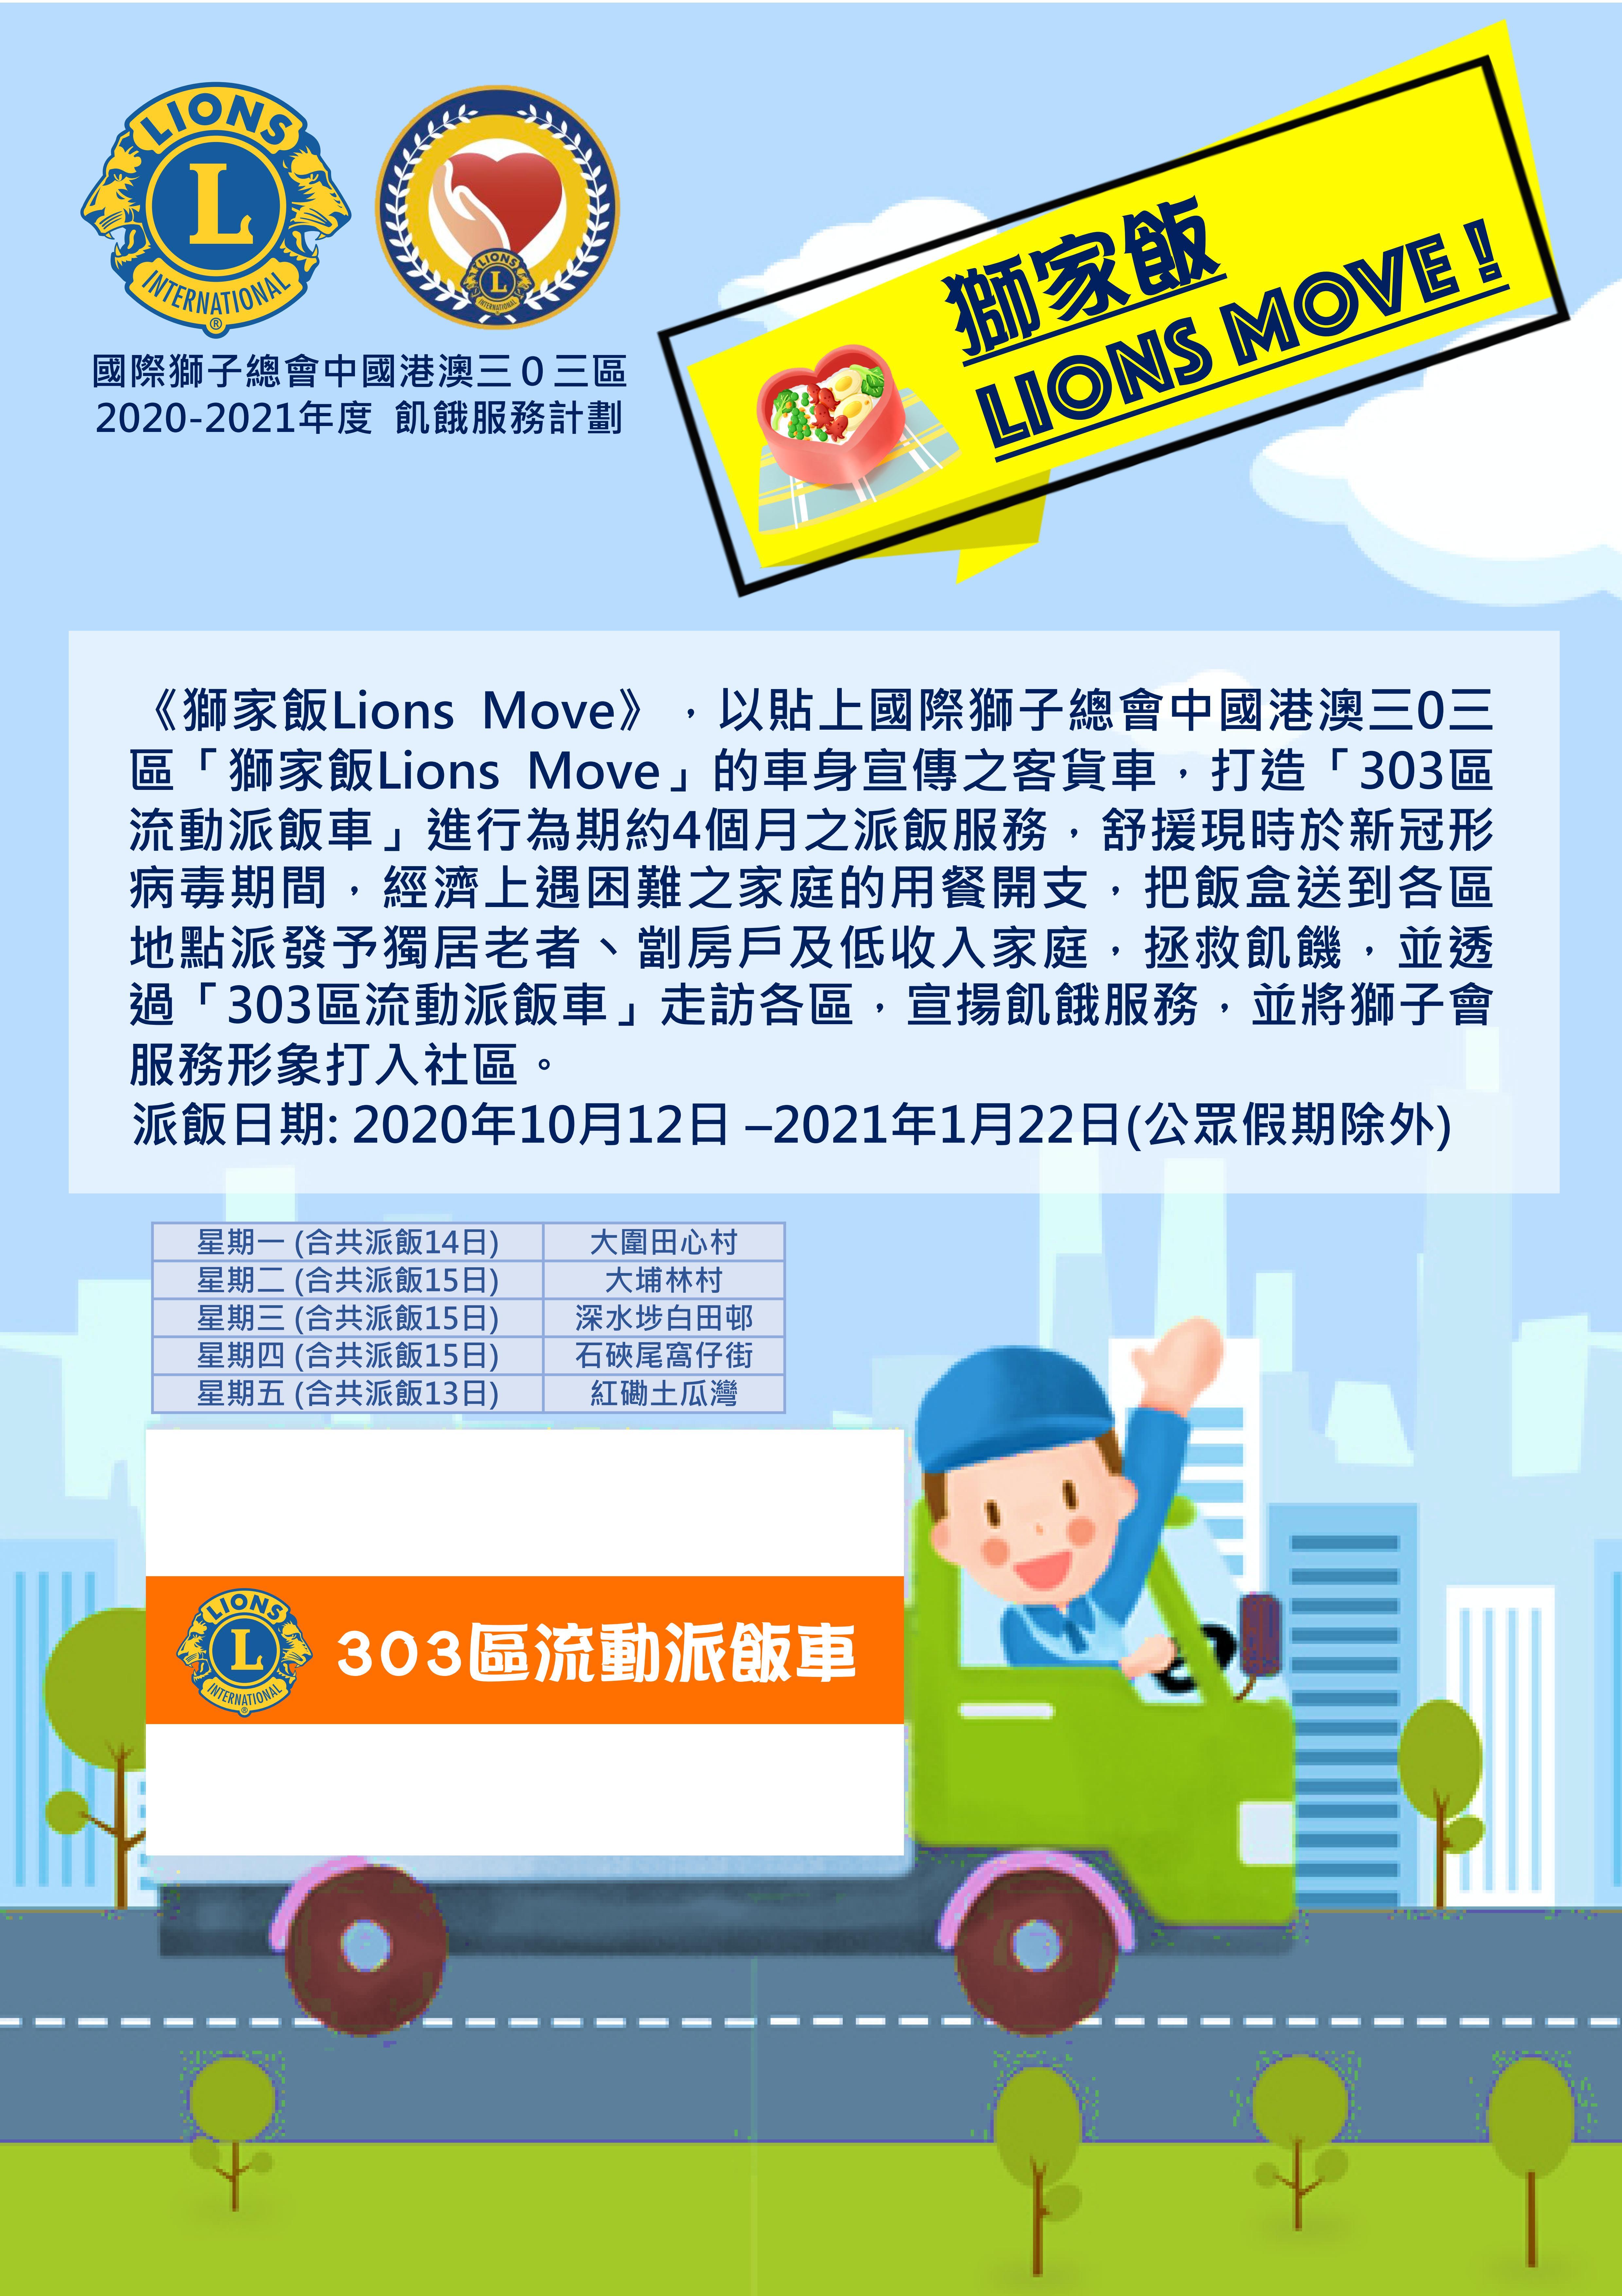 Lions Move.jpg (2.06 MB)